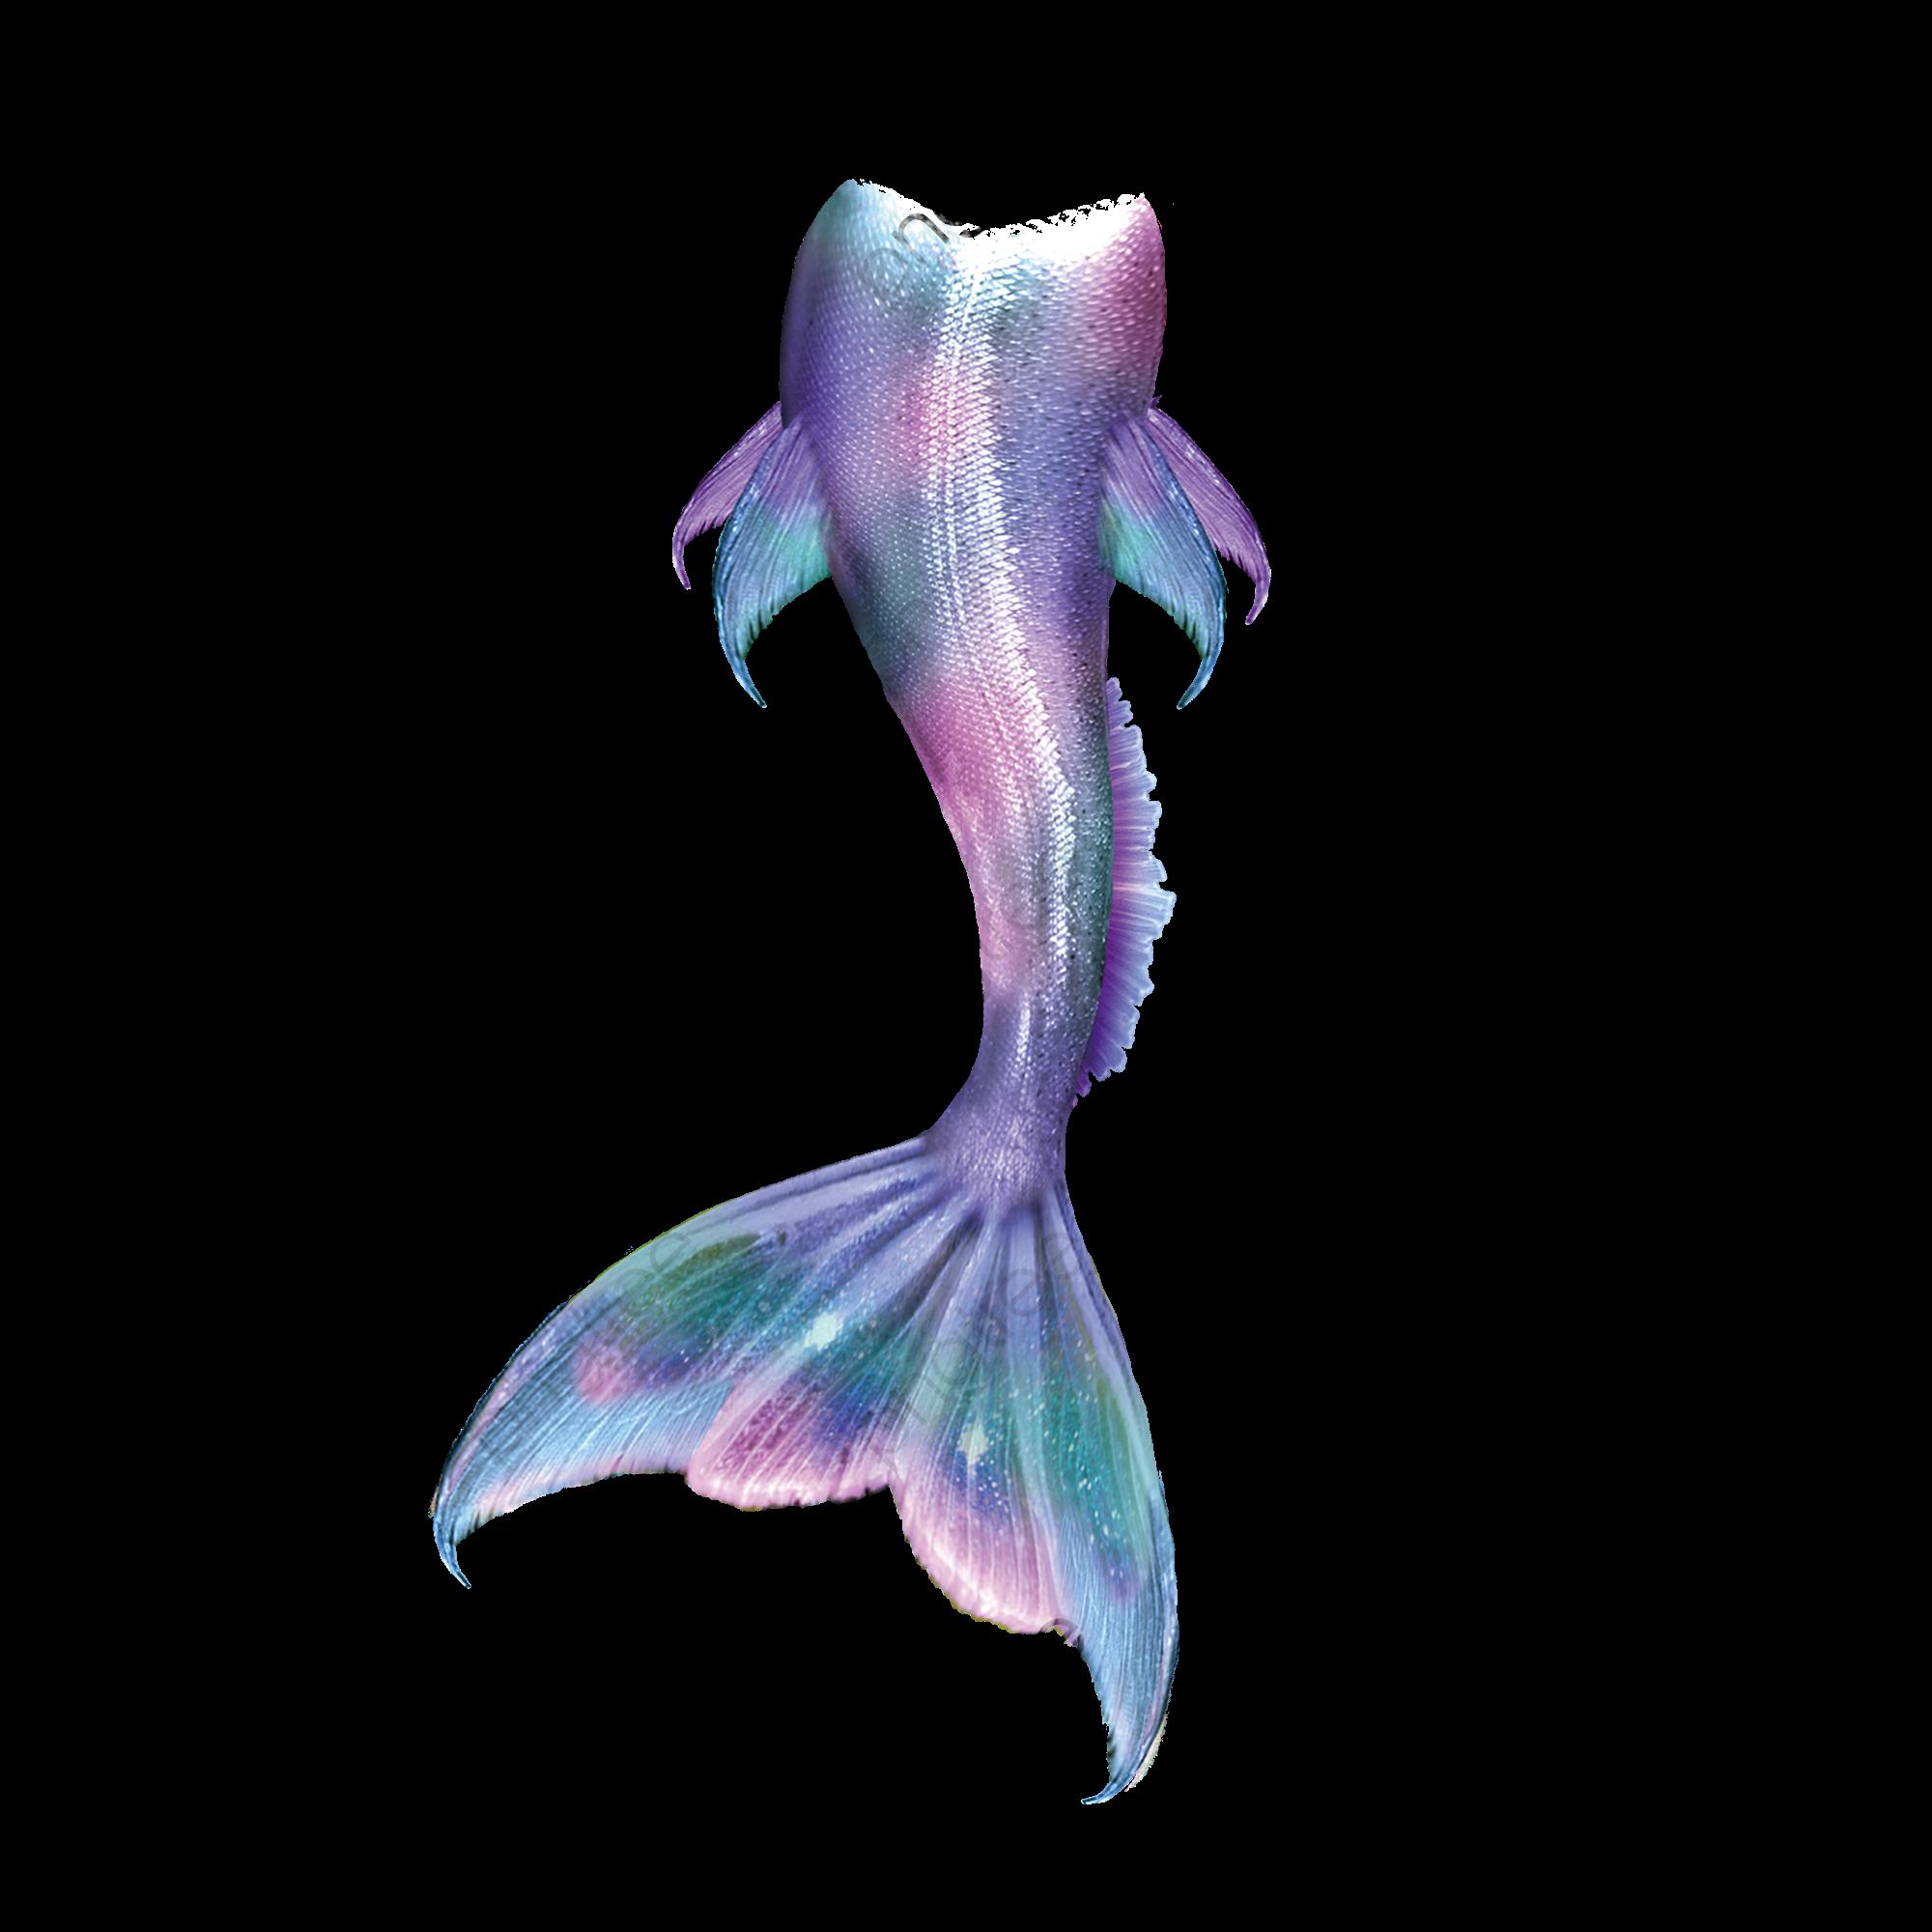 Pin By Lynette Jones On Fantasy Mermaid Clipart Blue Mermaid Tail Beautiful Mermaids